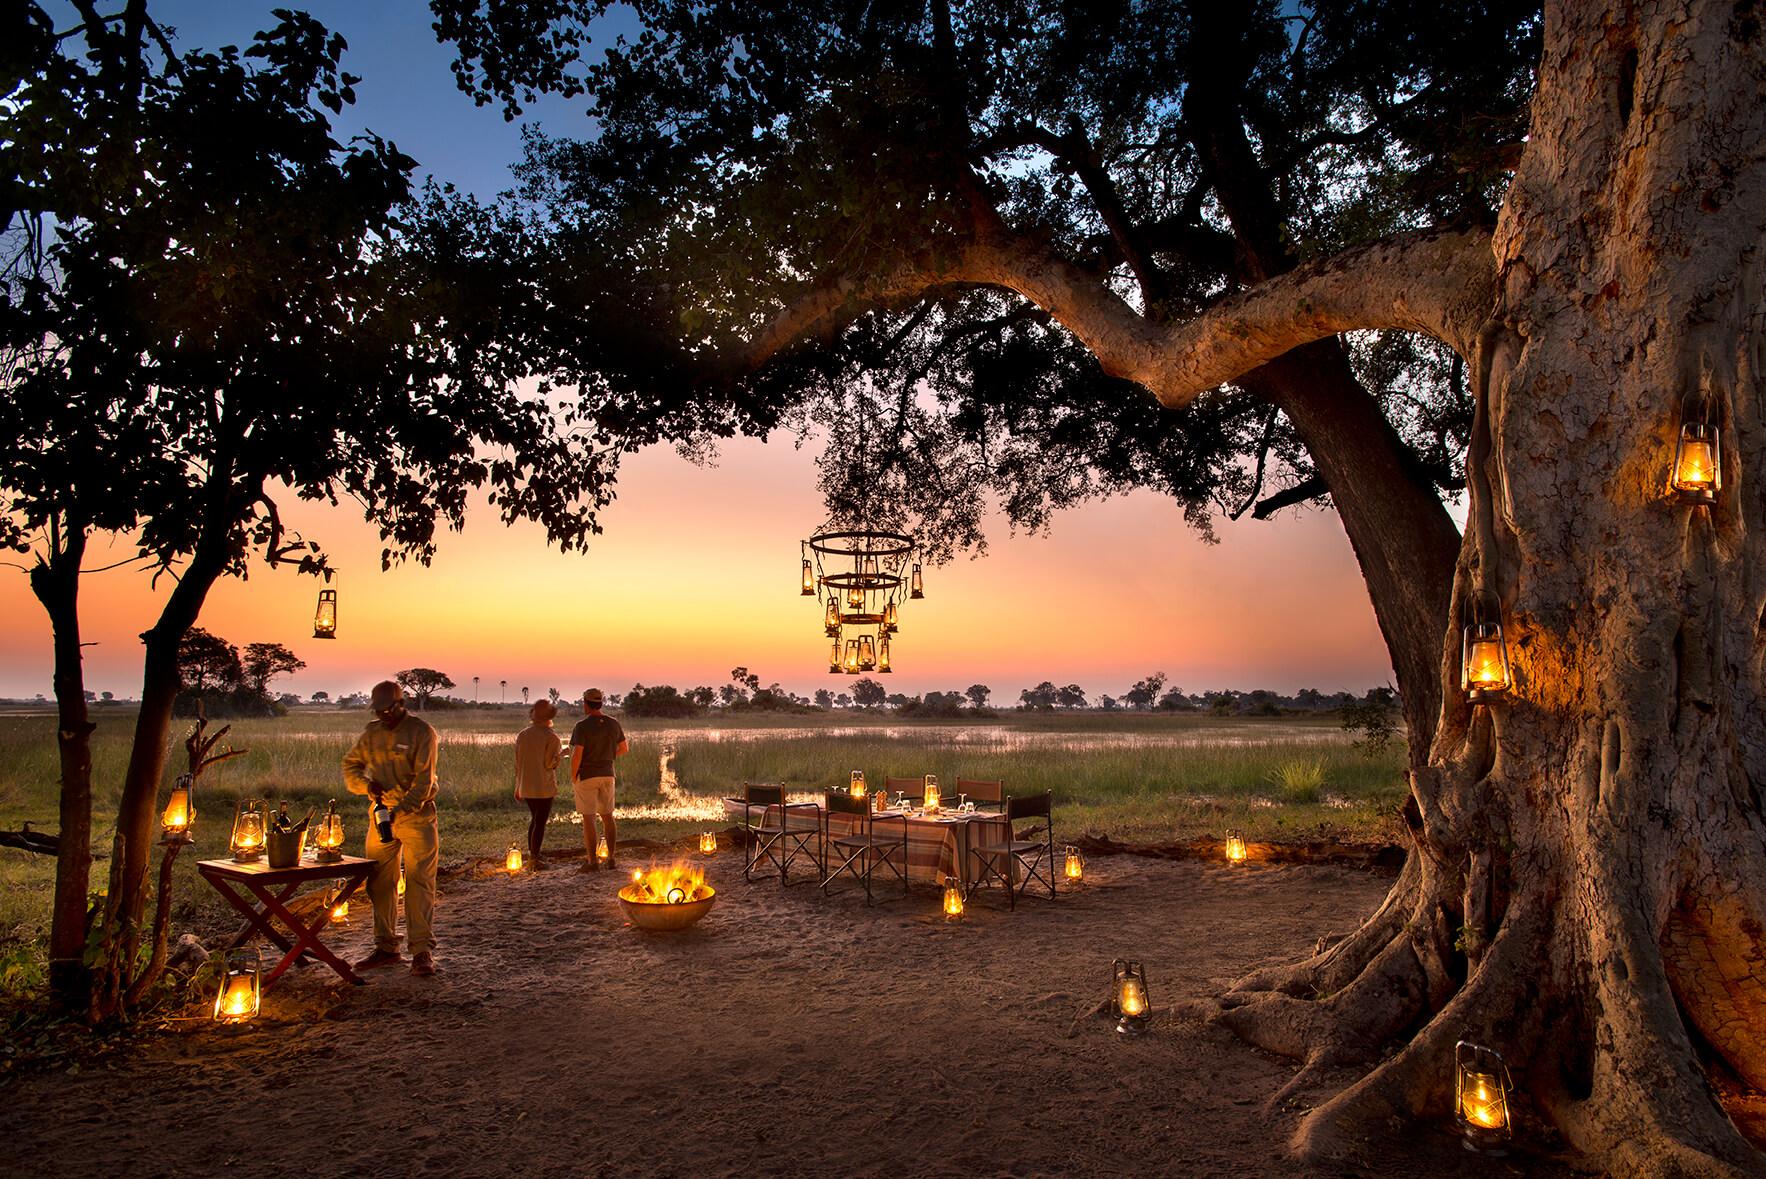 Risk of Travelling to Botswana